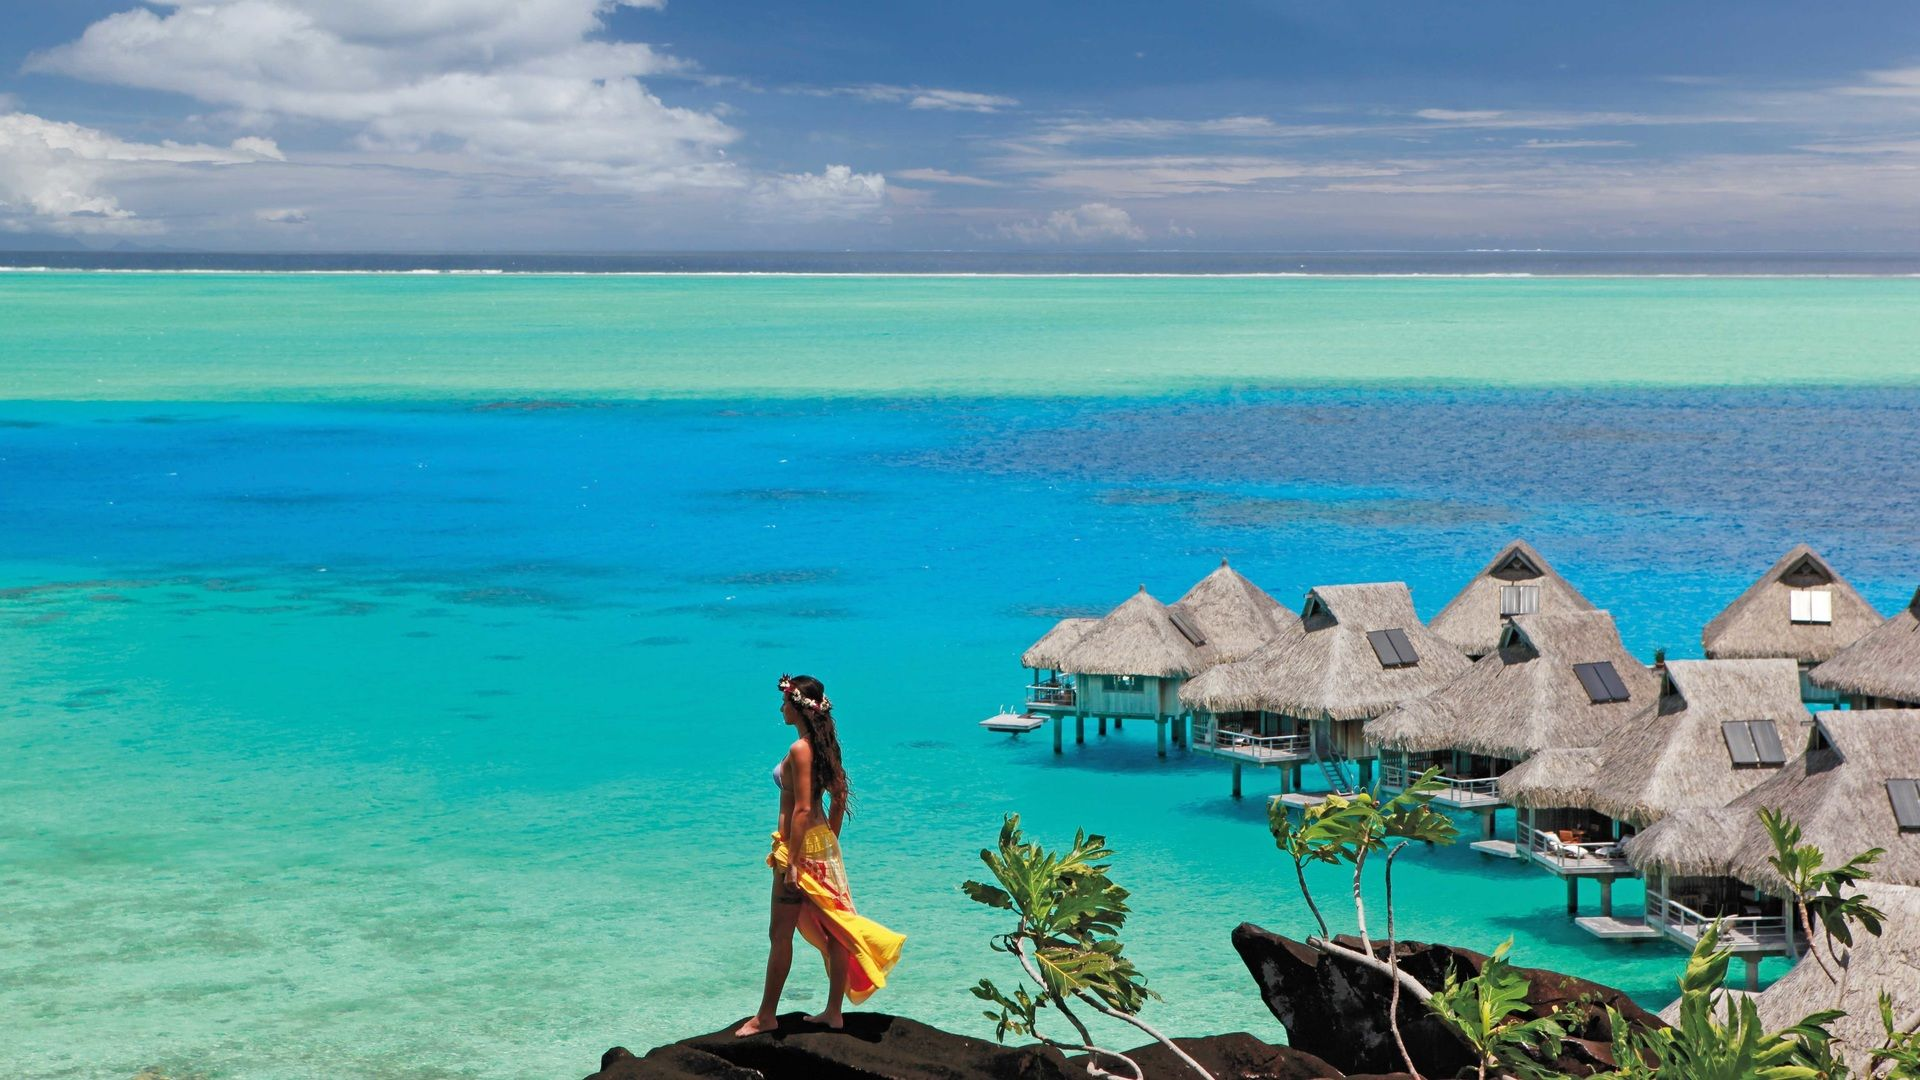 Bora Bora good background